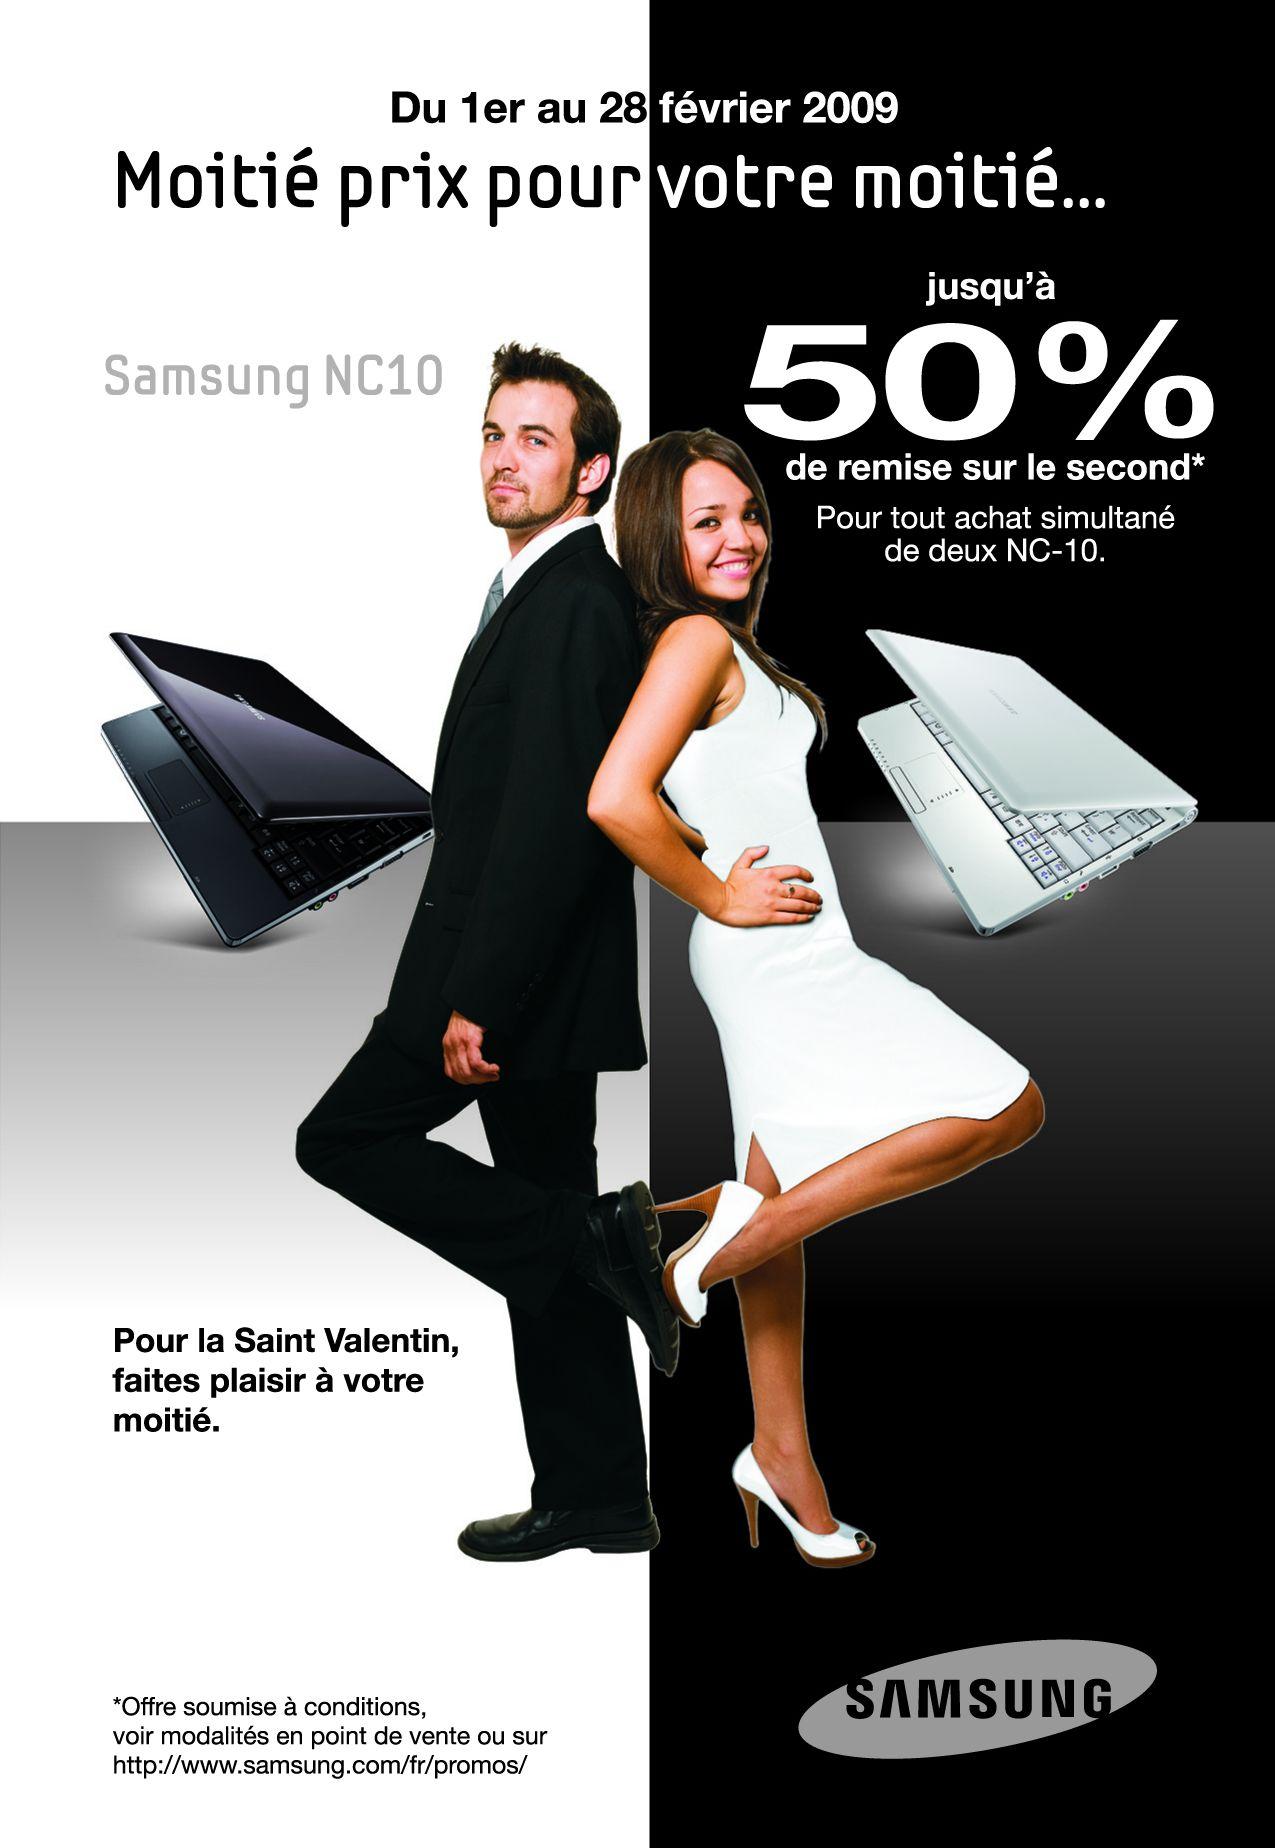 Samsung NC10 St Valentin formulaire